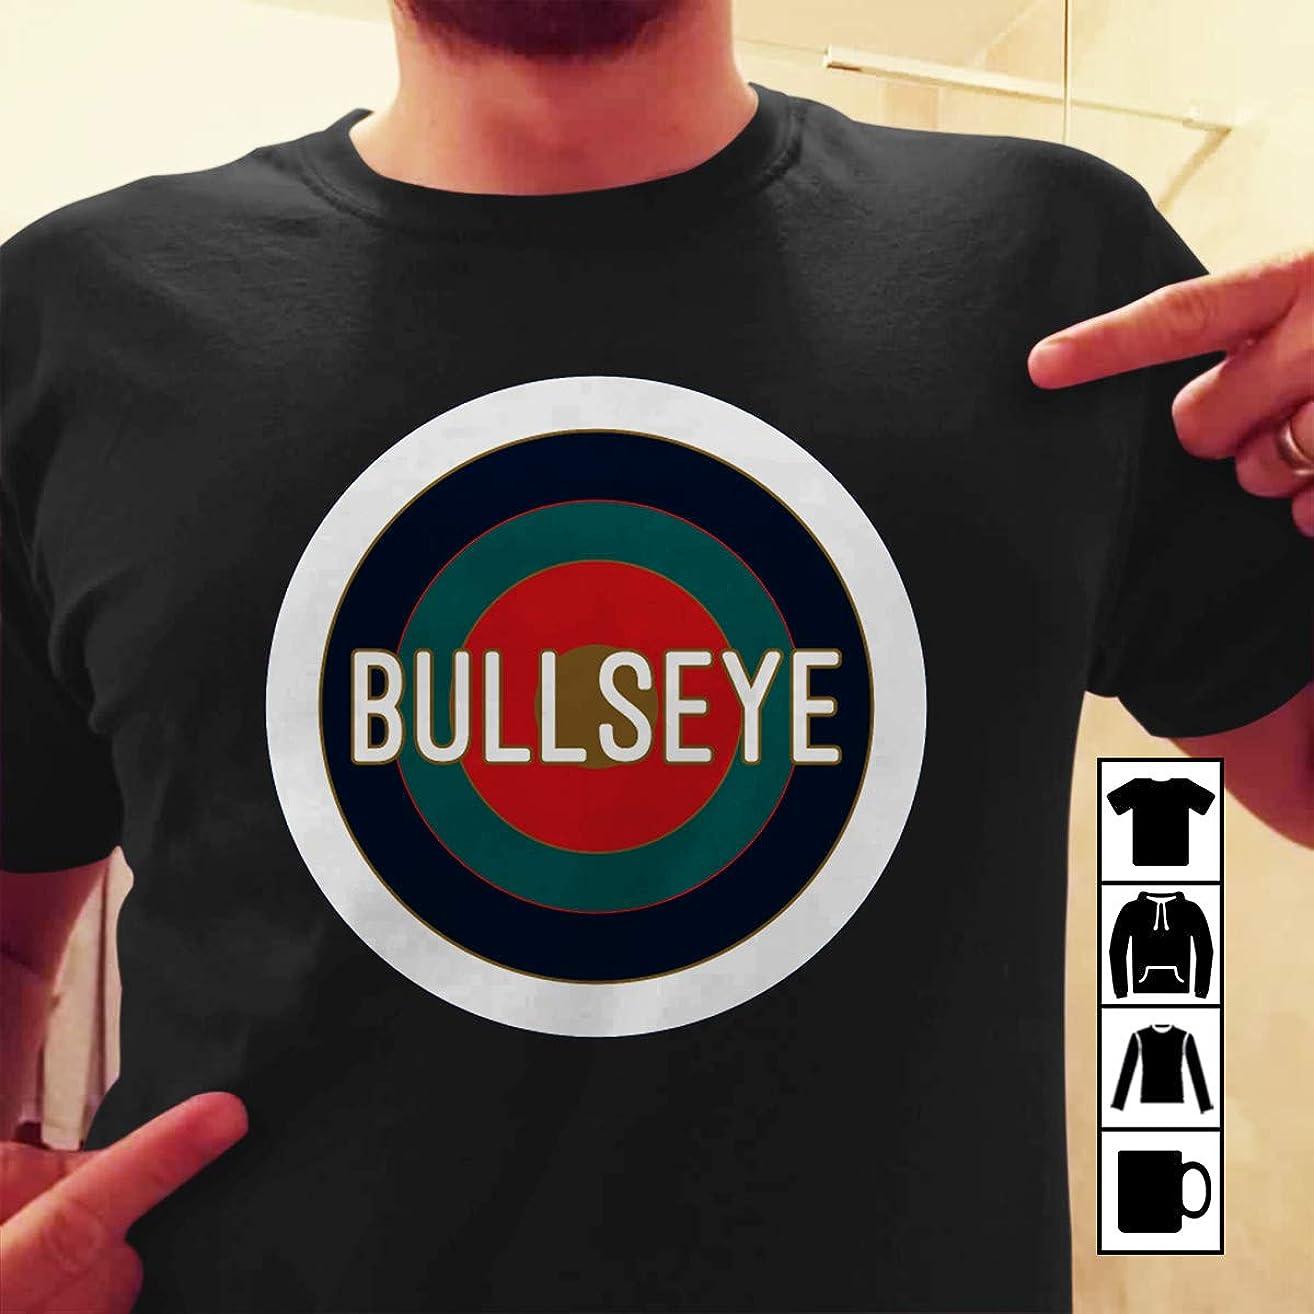 Bowman Archer Archery Bullseye target design T Shirt Long Sleeve Sweatshirt Hoodie Youth